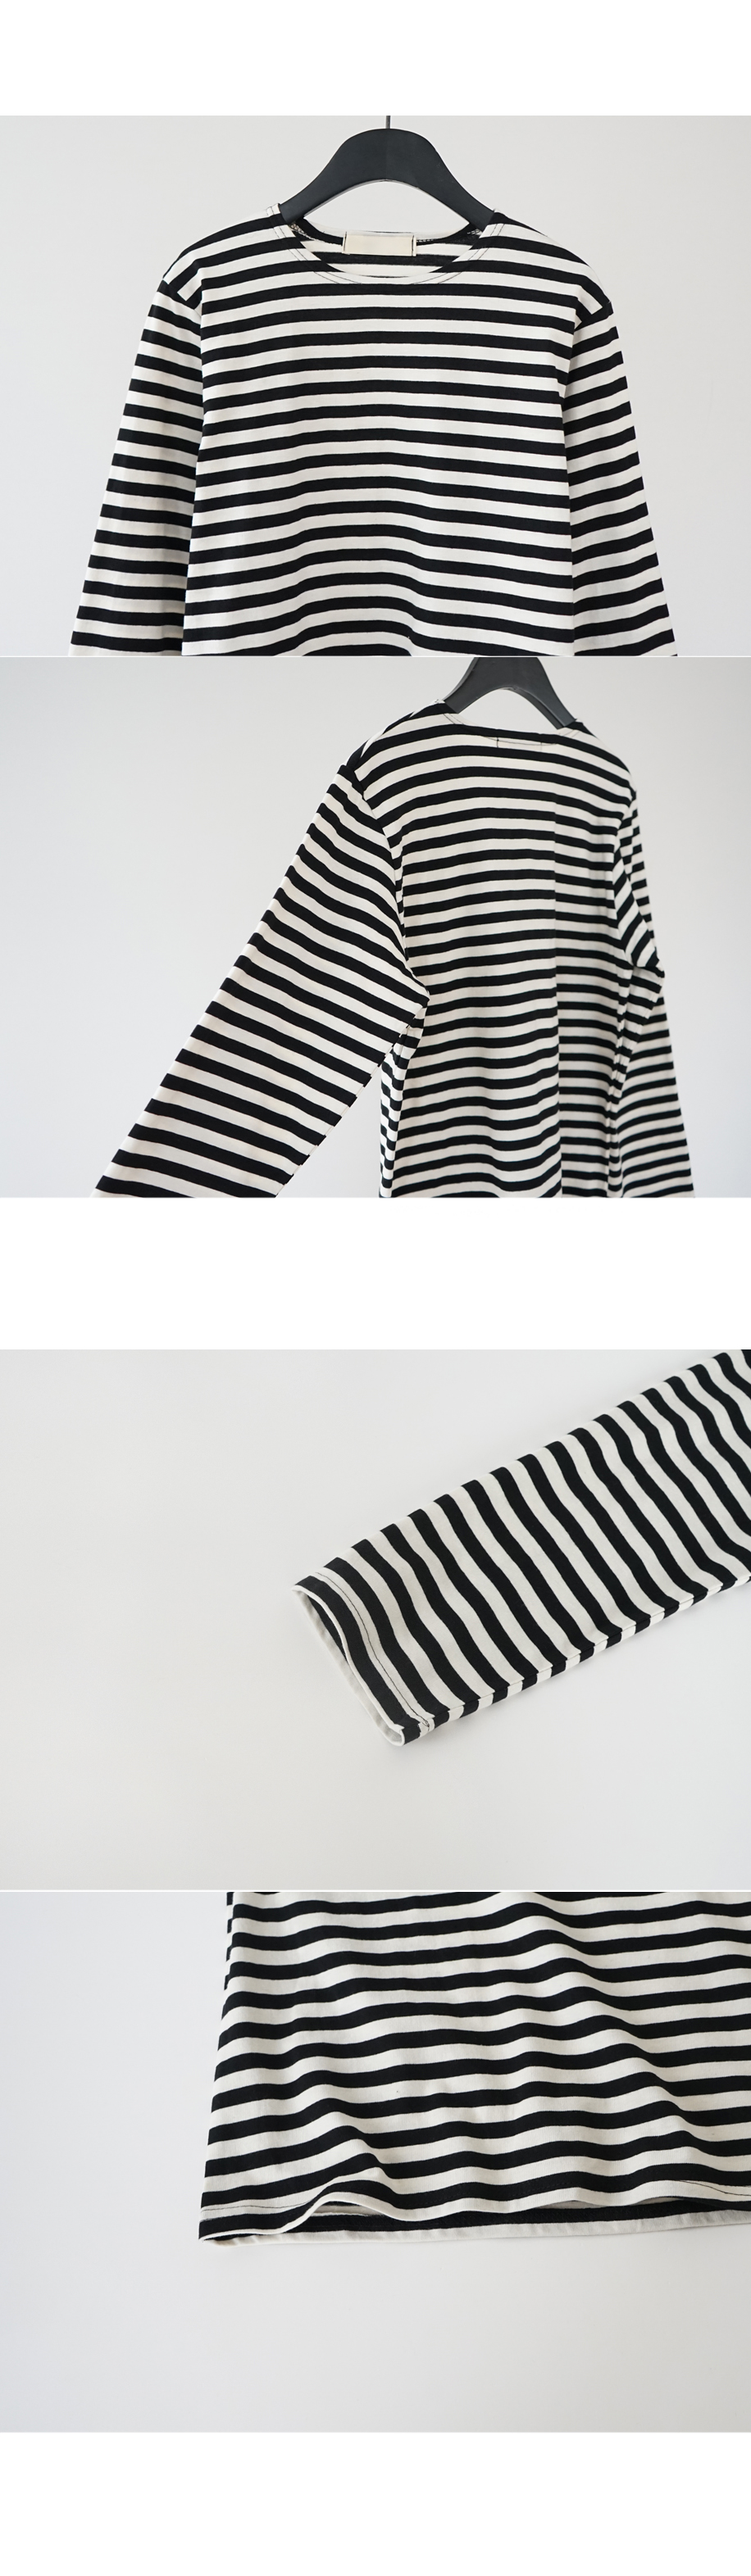 steady stripe tee (3colors)